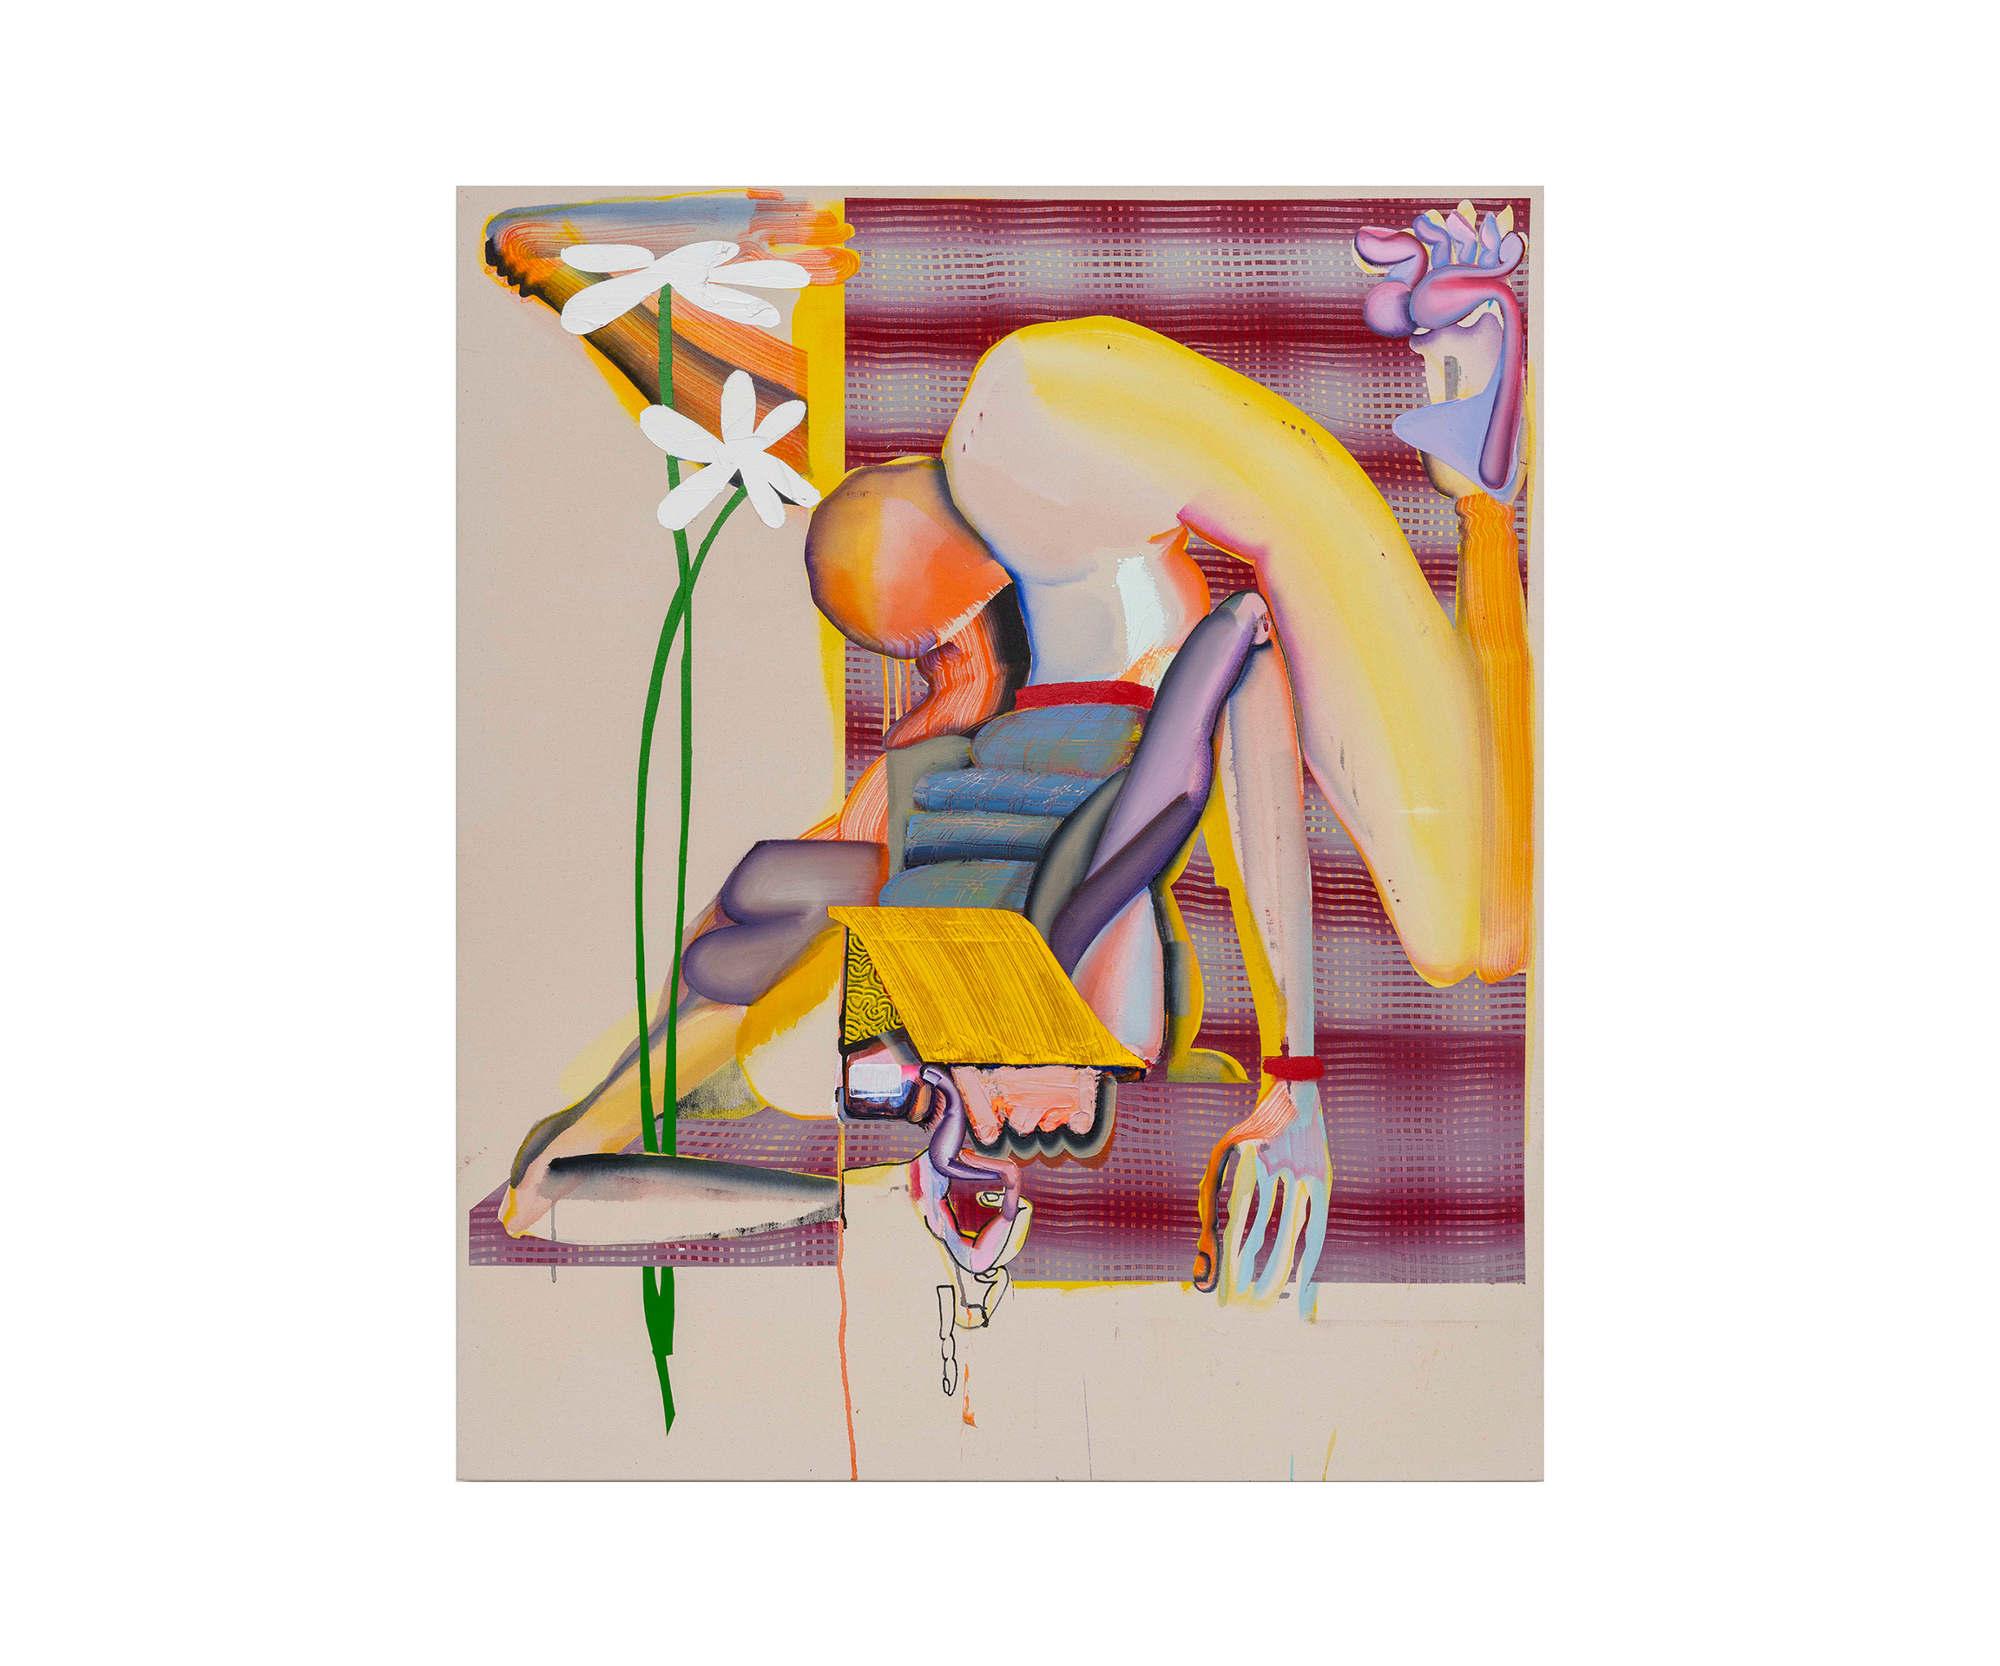 paintings_0012_QUAR-2018010-Bottoms-Up-MR_2000_c.jpg